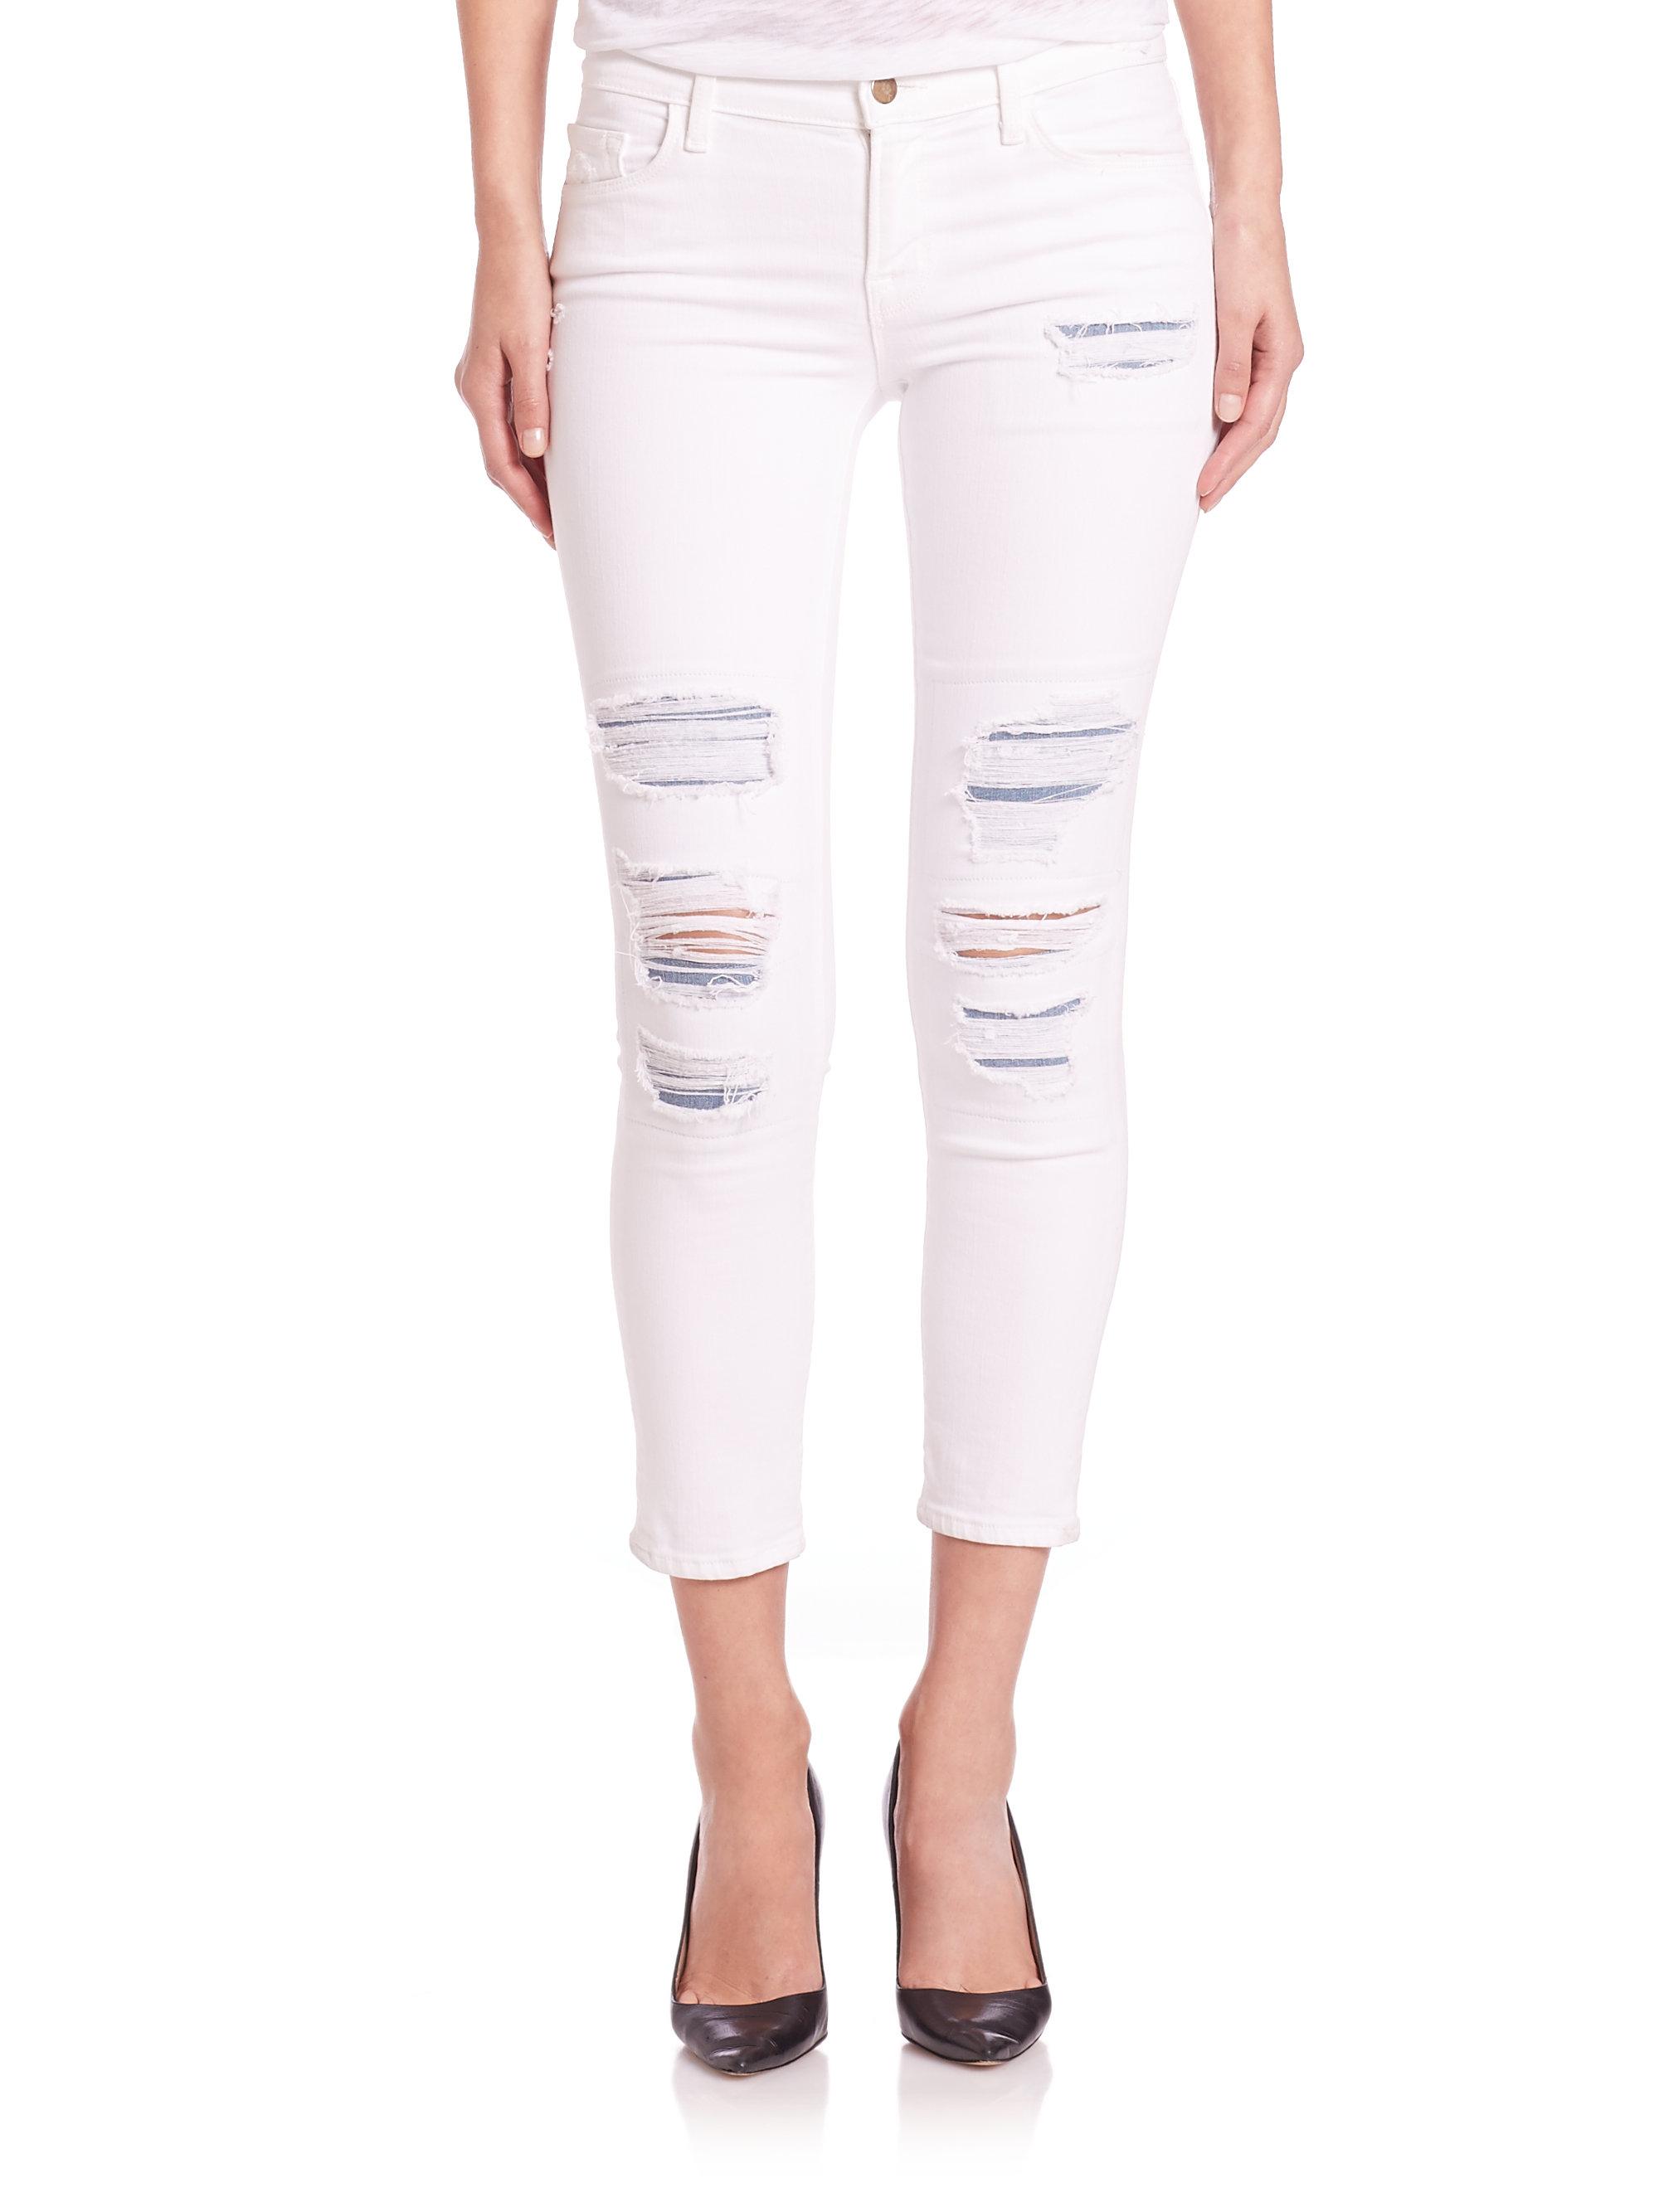 5239d7142f98 J brand Distressed Mid-rise Capri Jeans in White